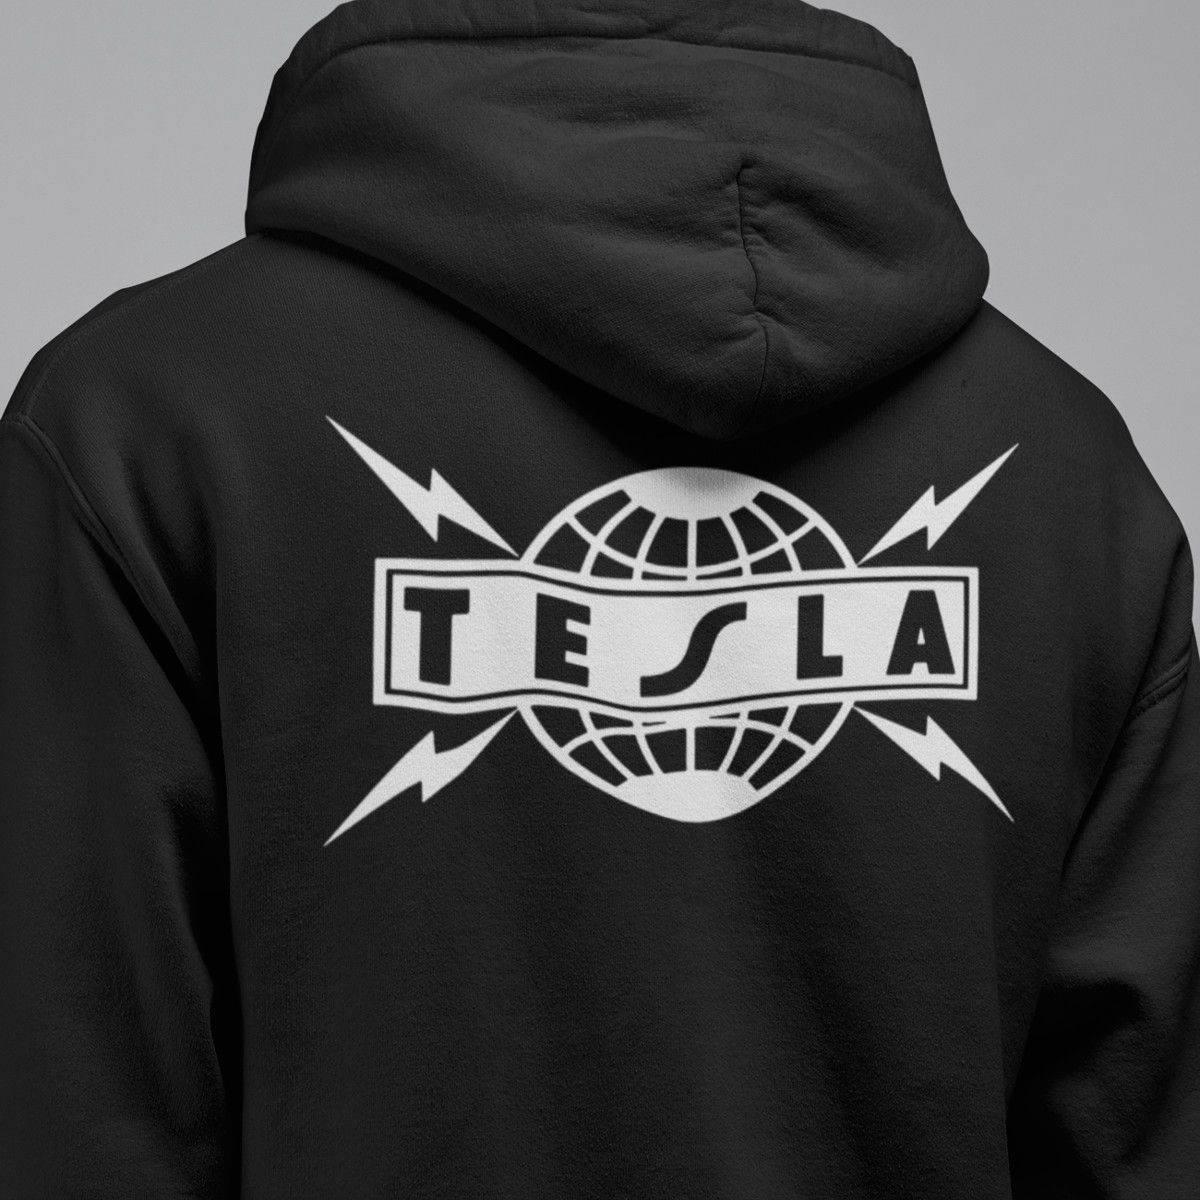 Tesla Band Hoodie, Tesla Logo Hooded Sweatshirt, Blues, Hard Rock, Heavy  Metal Merch